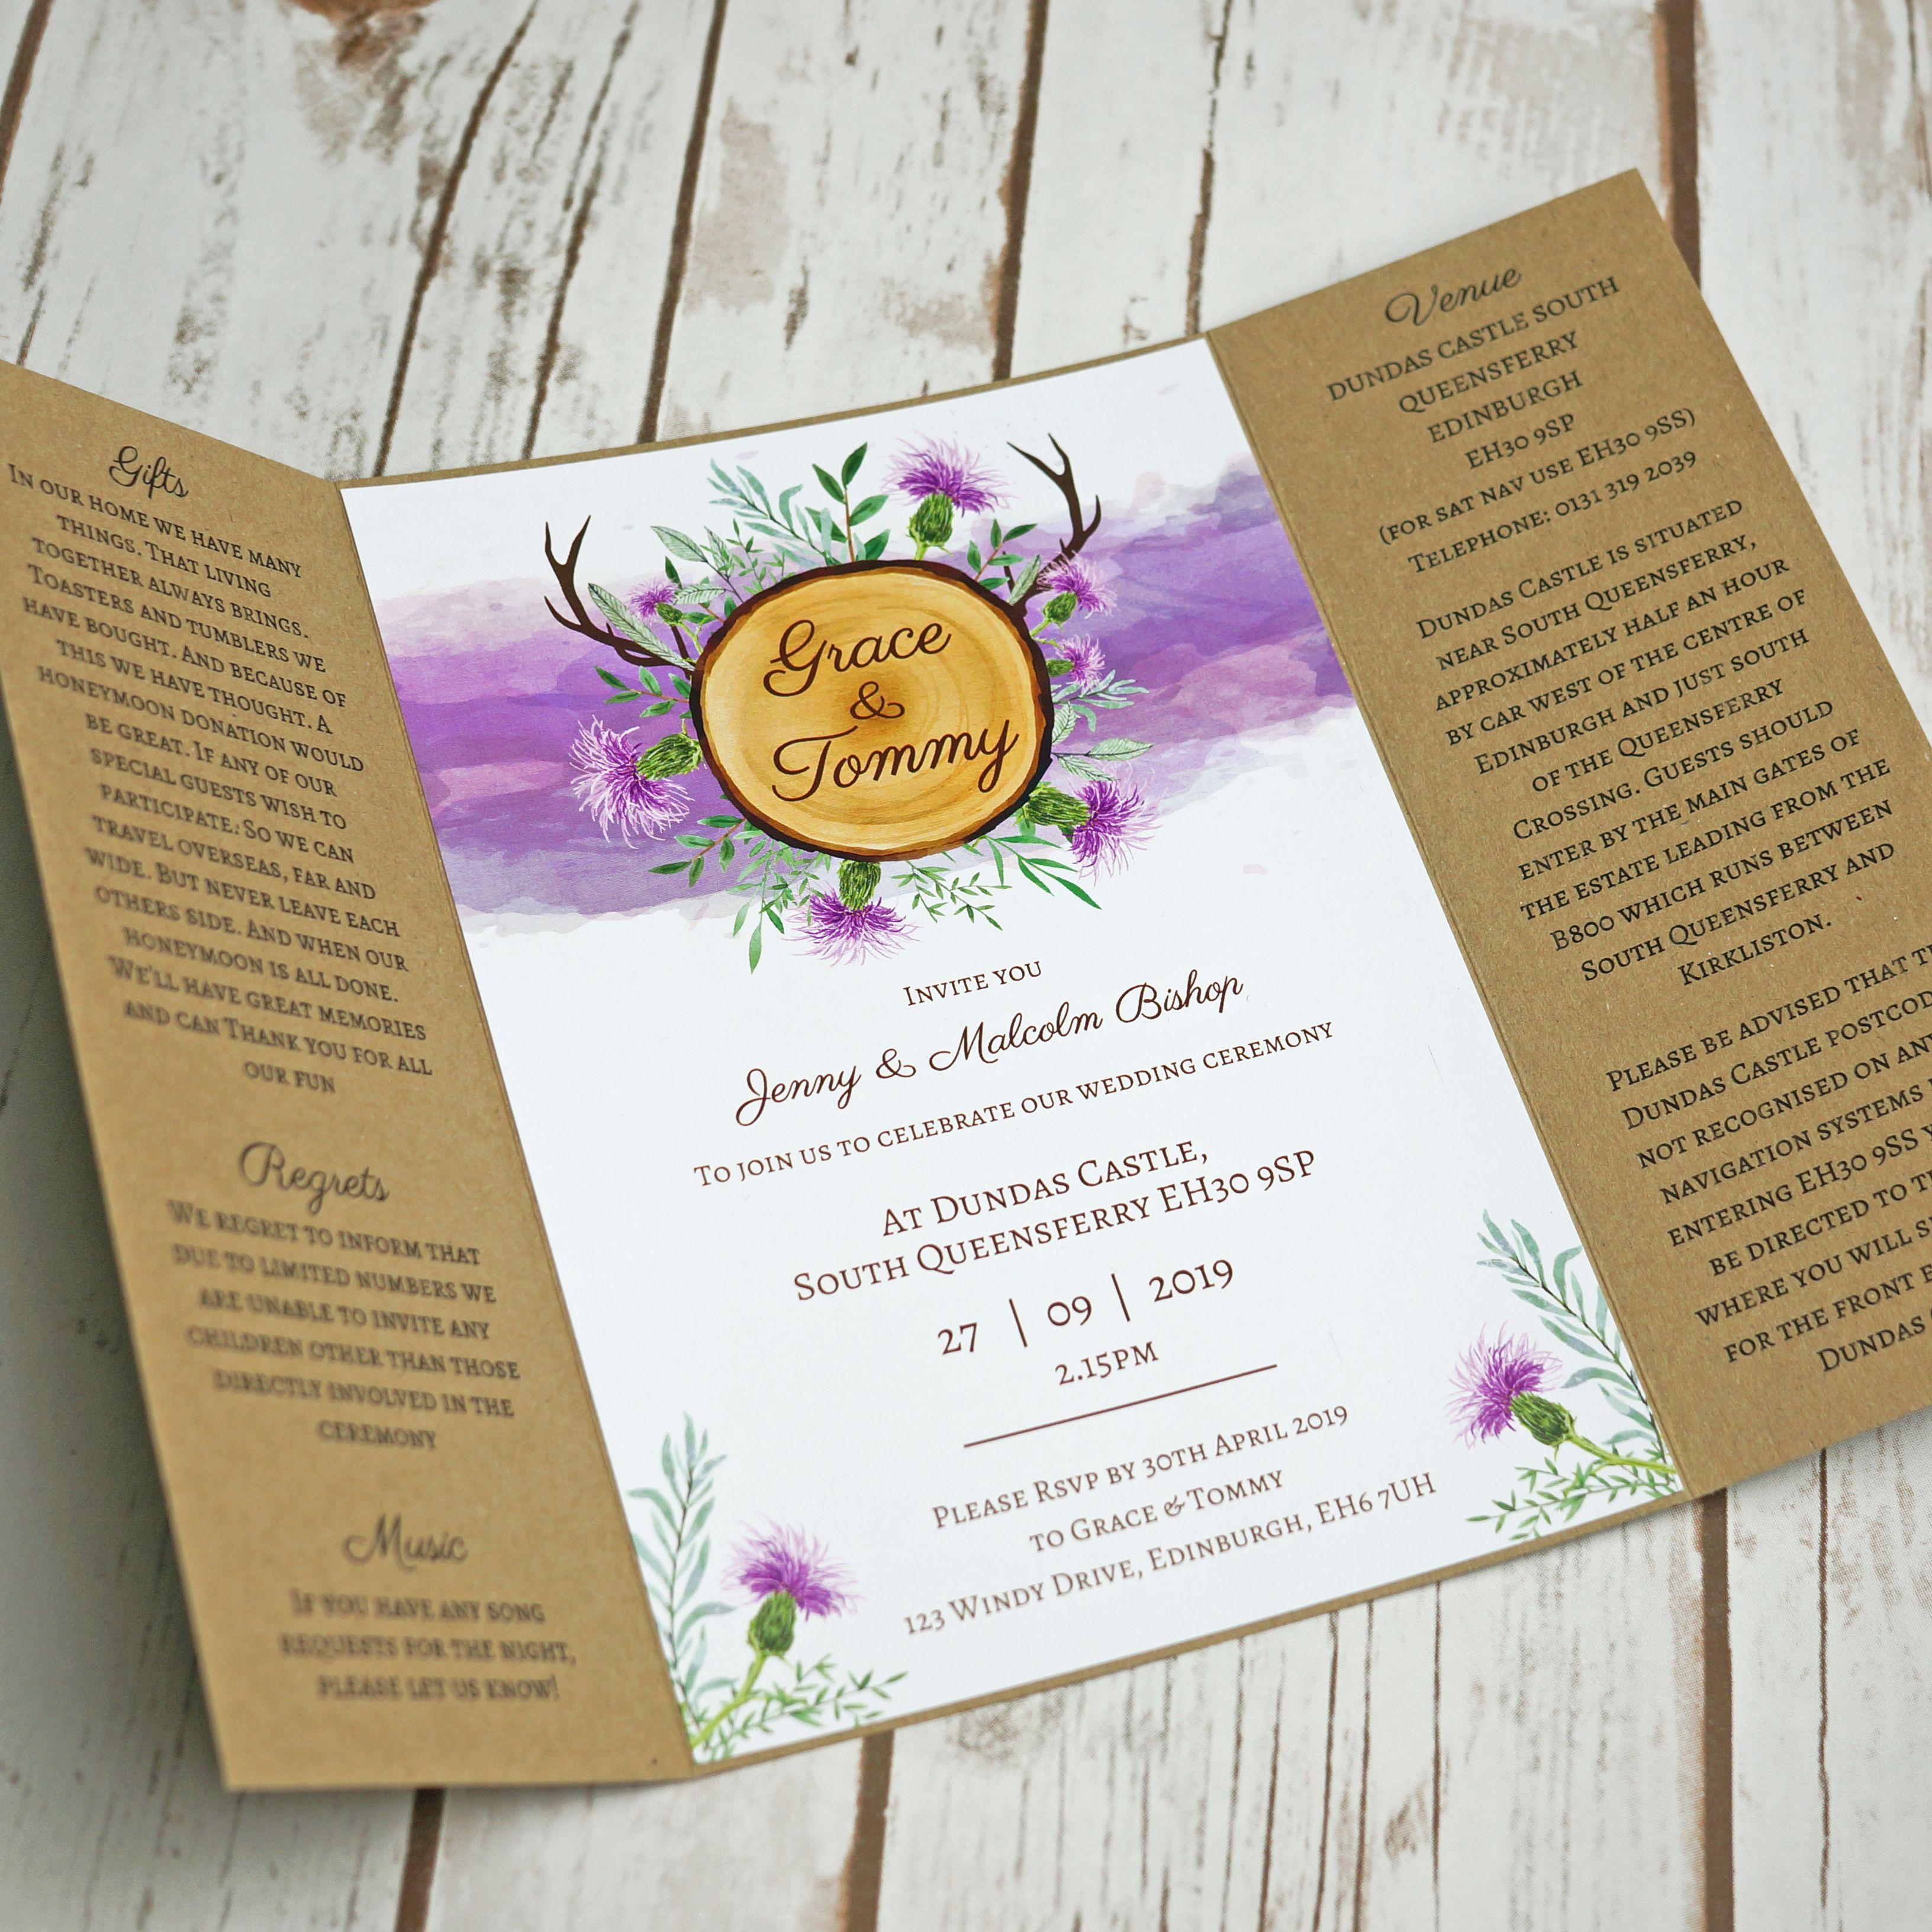 Rustic Door Wedding Ideas: Scottish Rustic Gatefold Wedding Invitations